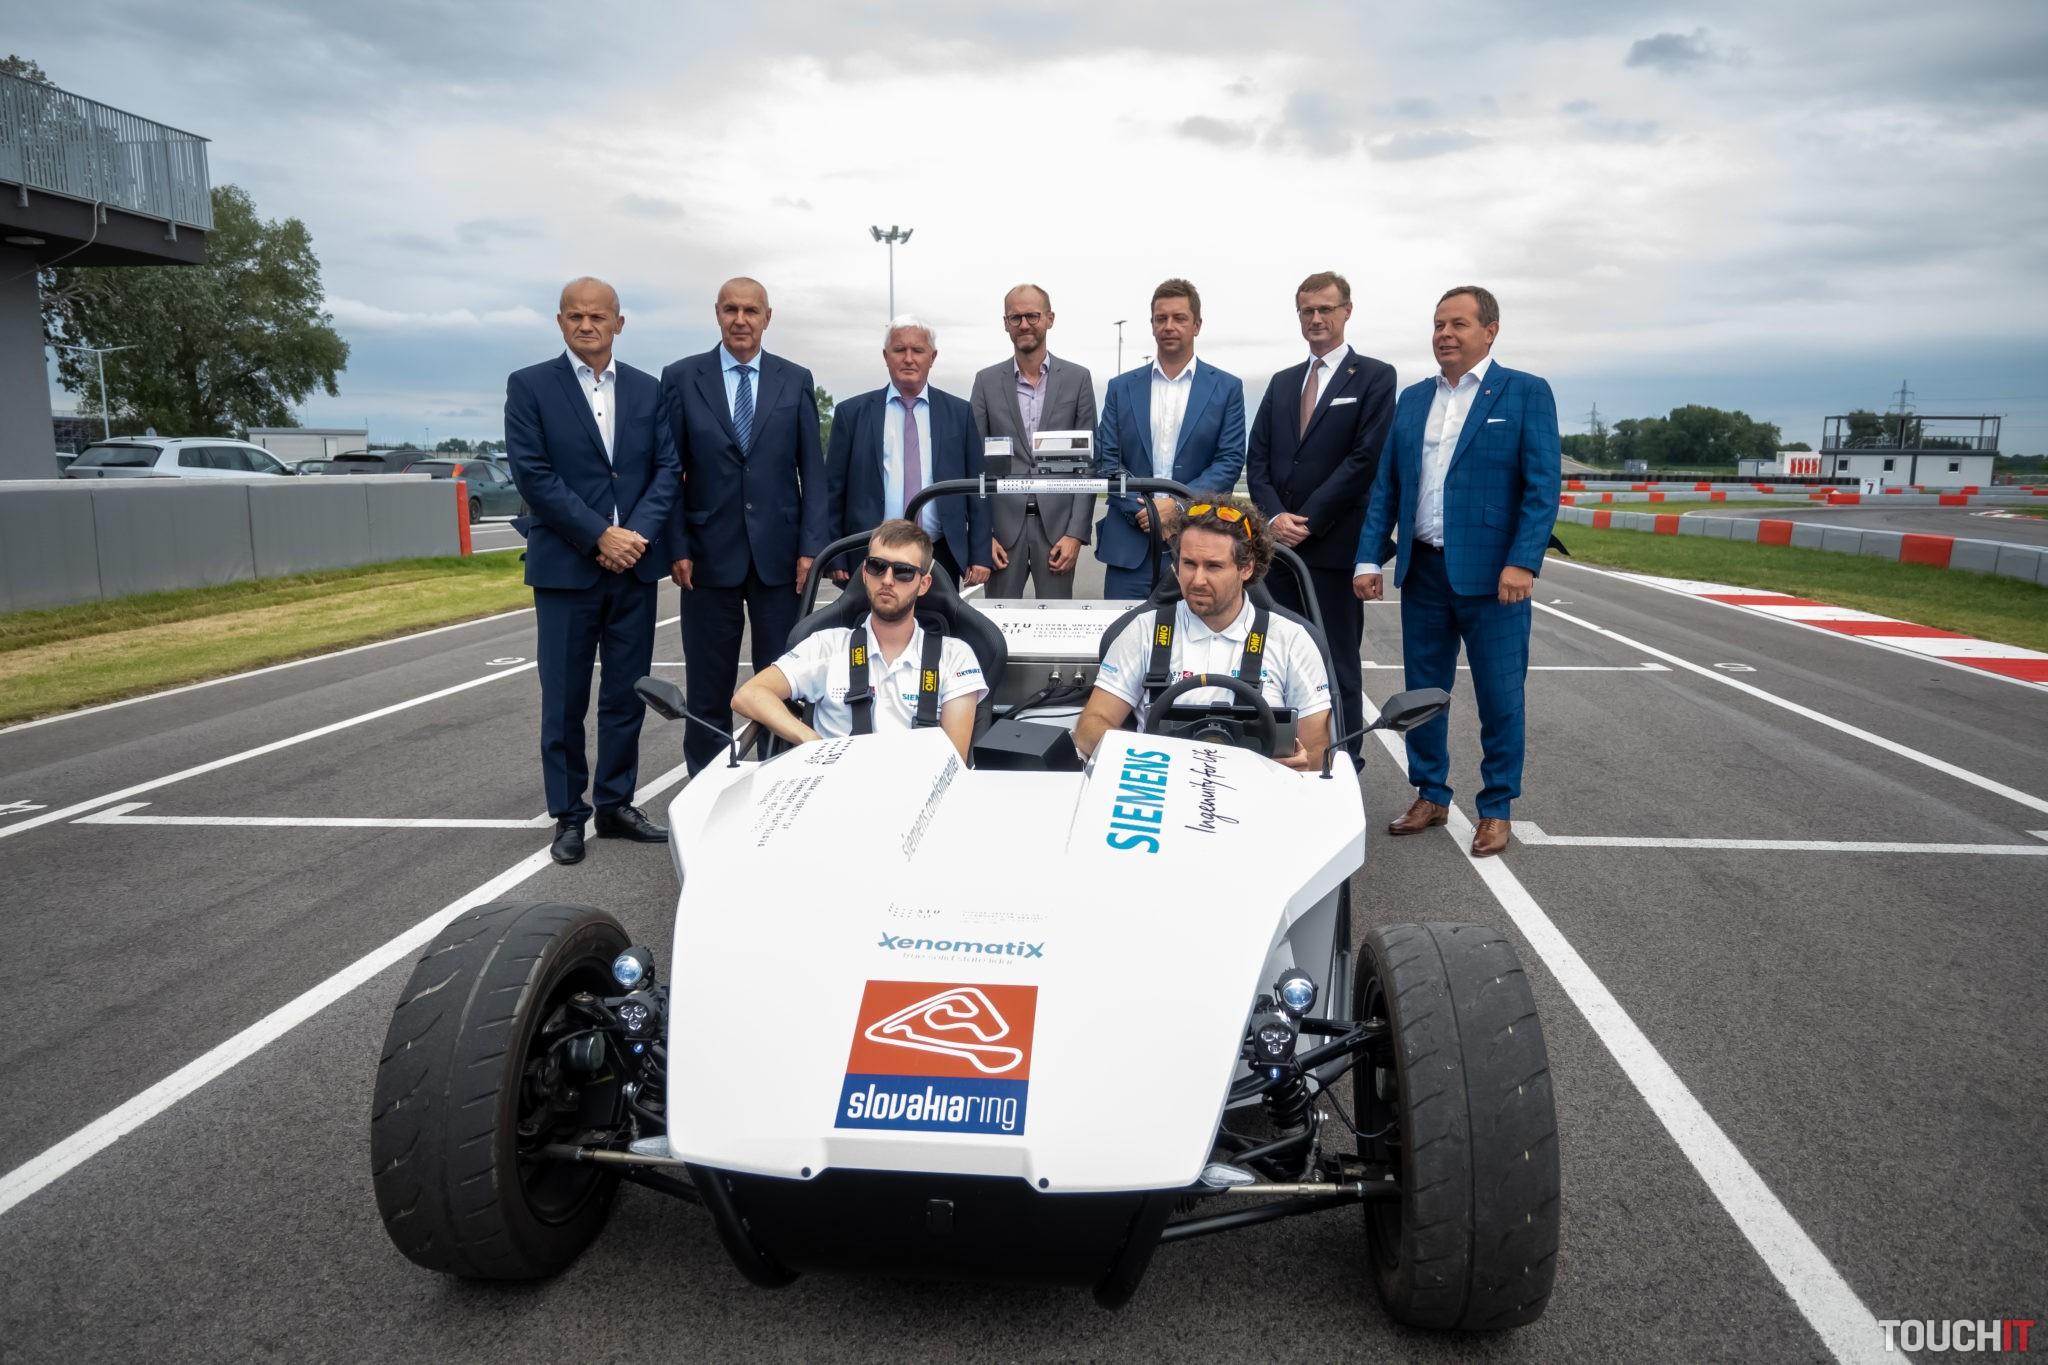 Autonómne auto a jeho podpora